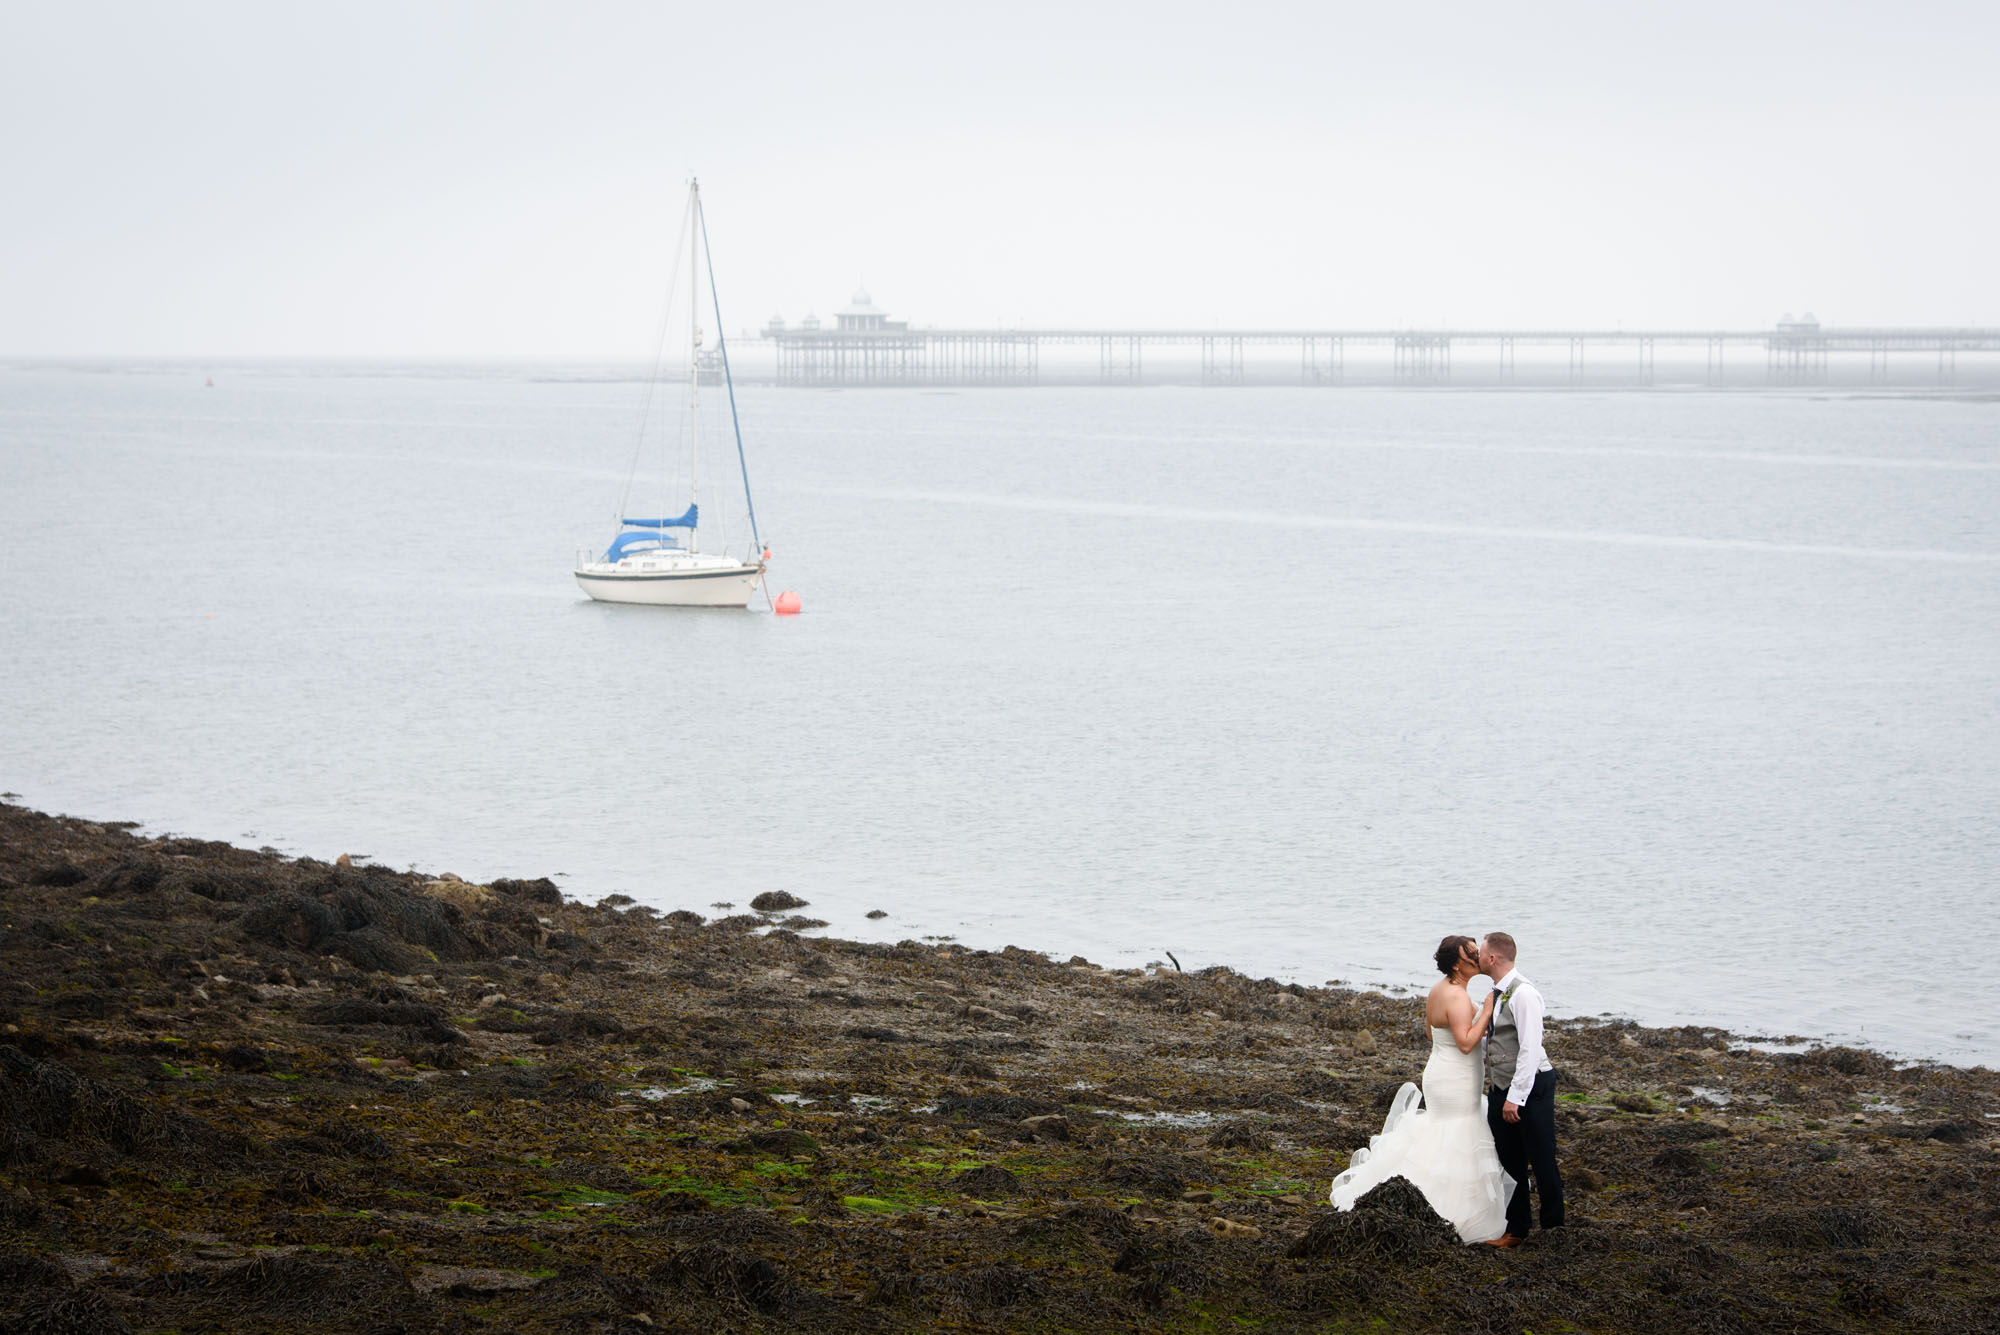 Wedding portrait on the shore of Menai Strait